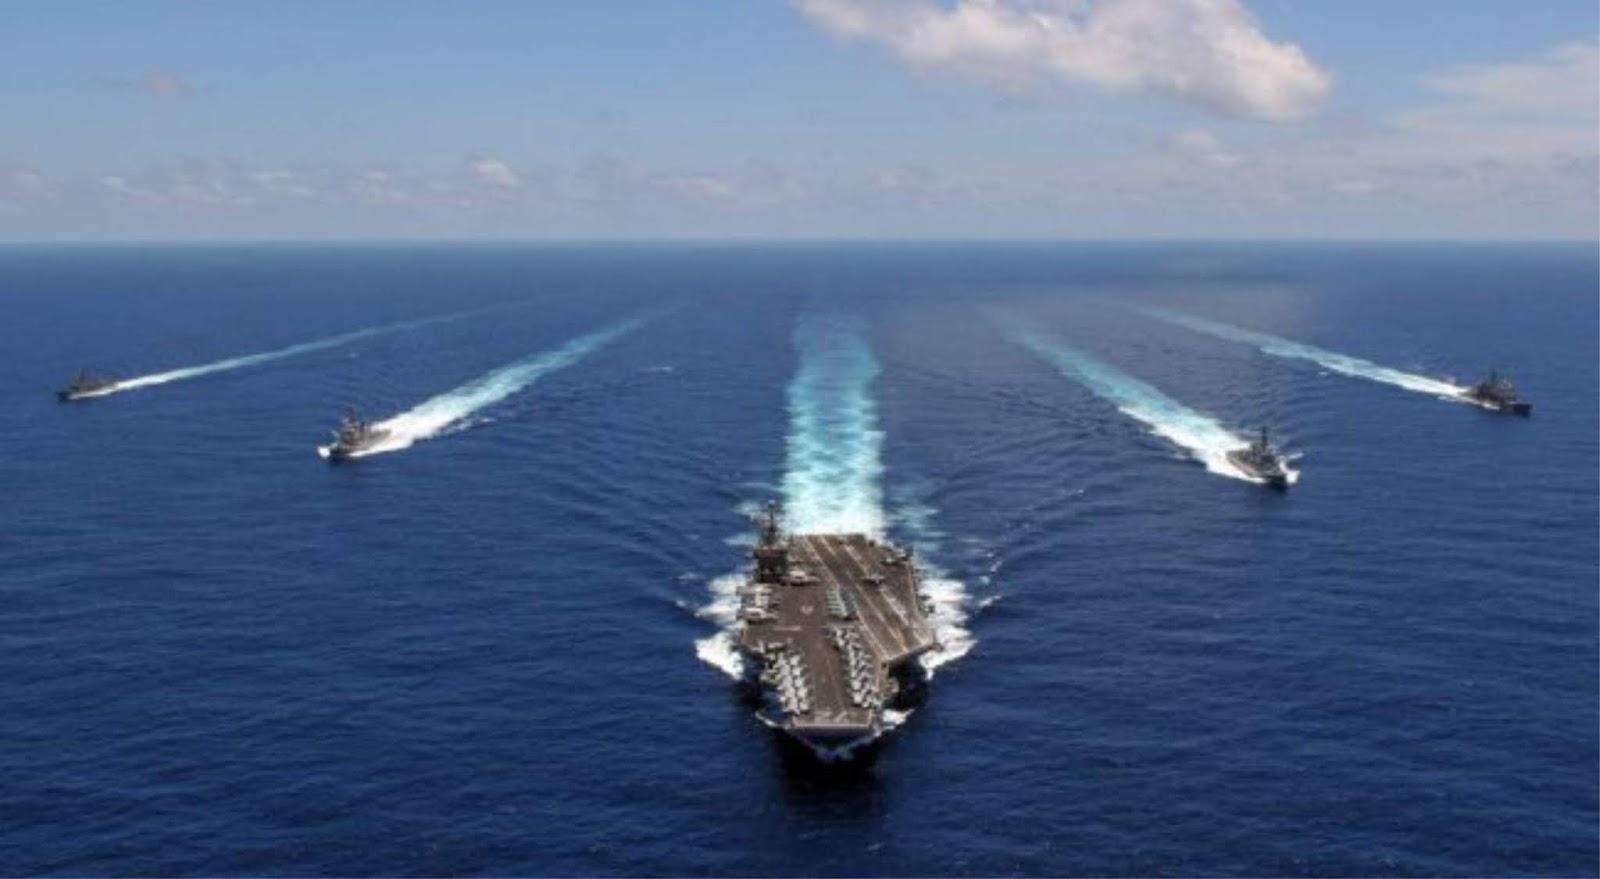 Cina akan mengambil langkah-langkah yang diperlukan untuk menjamin keamanan di Laut Cina Selatan